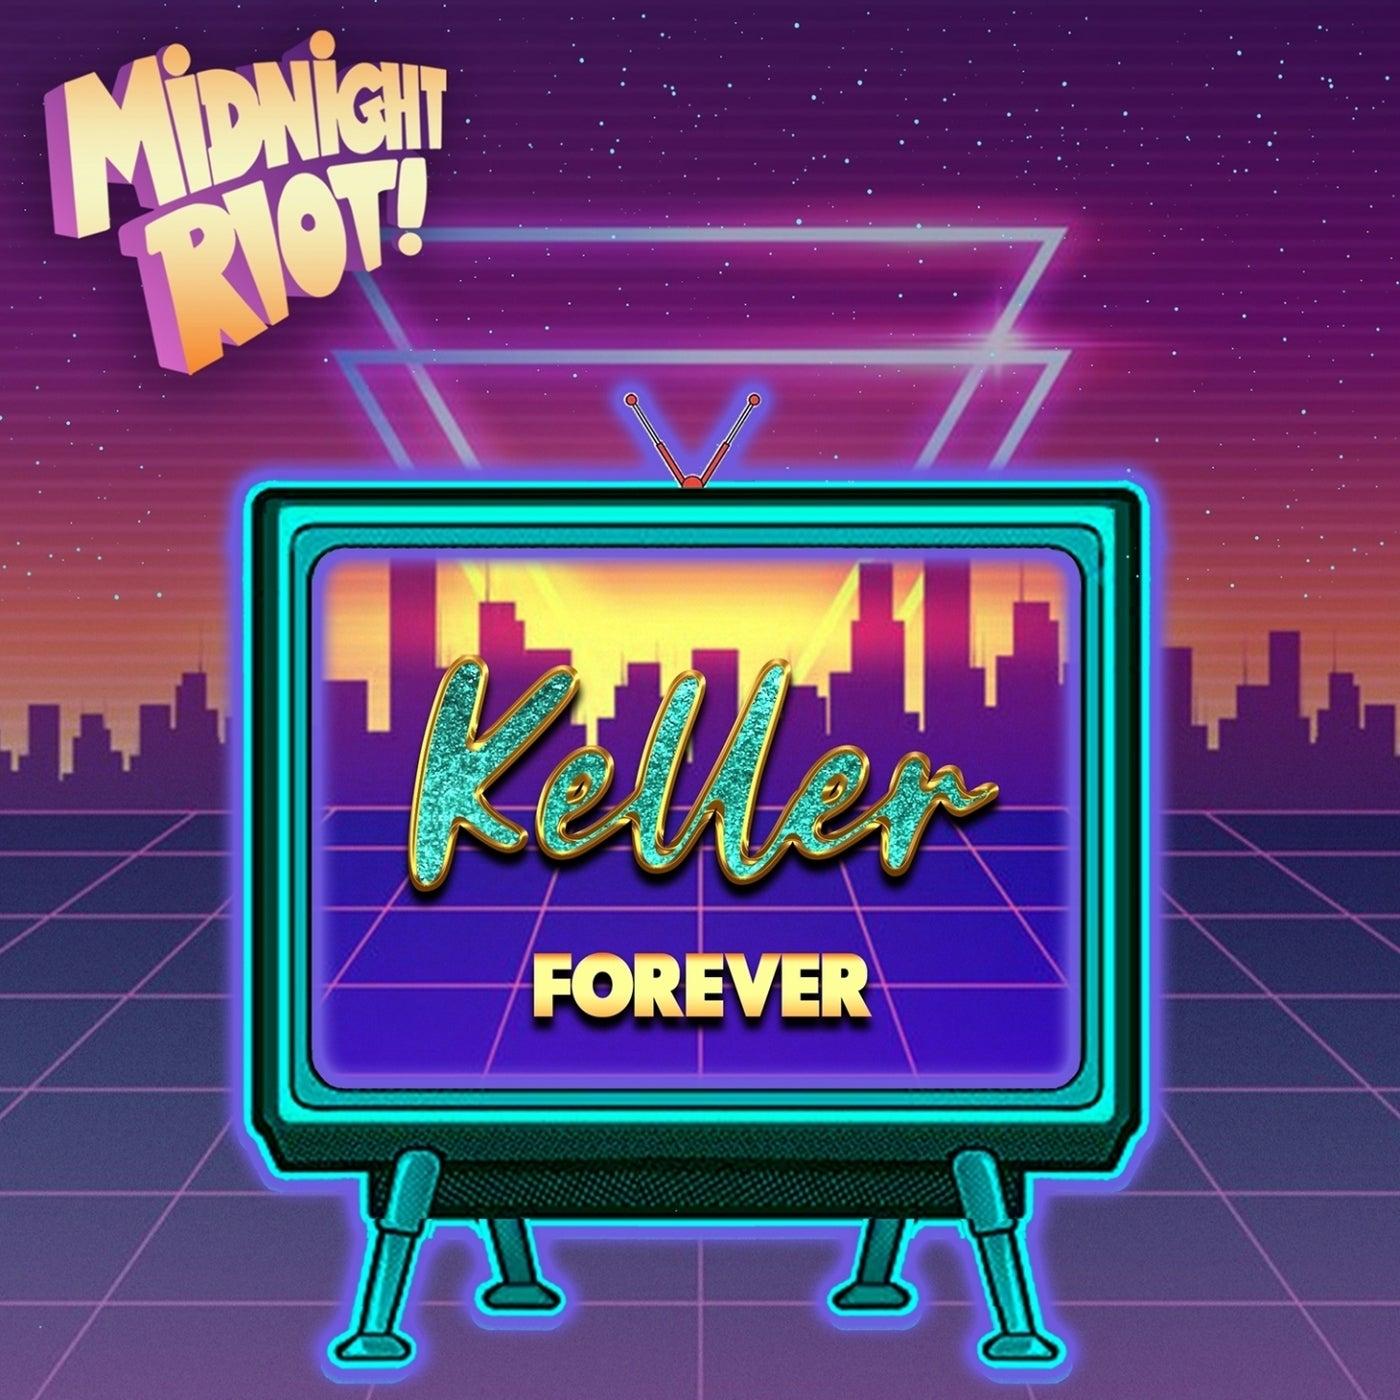 Forever (The Dukes Main Extended Mix)